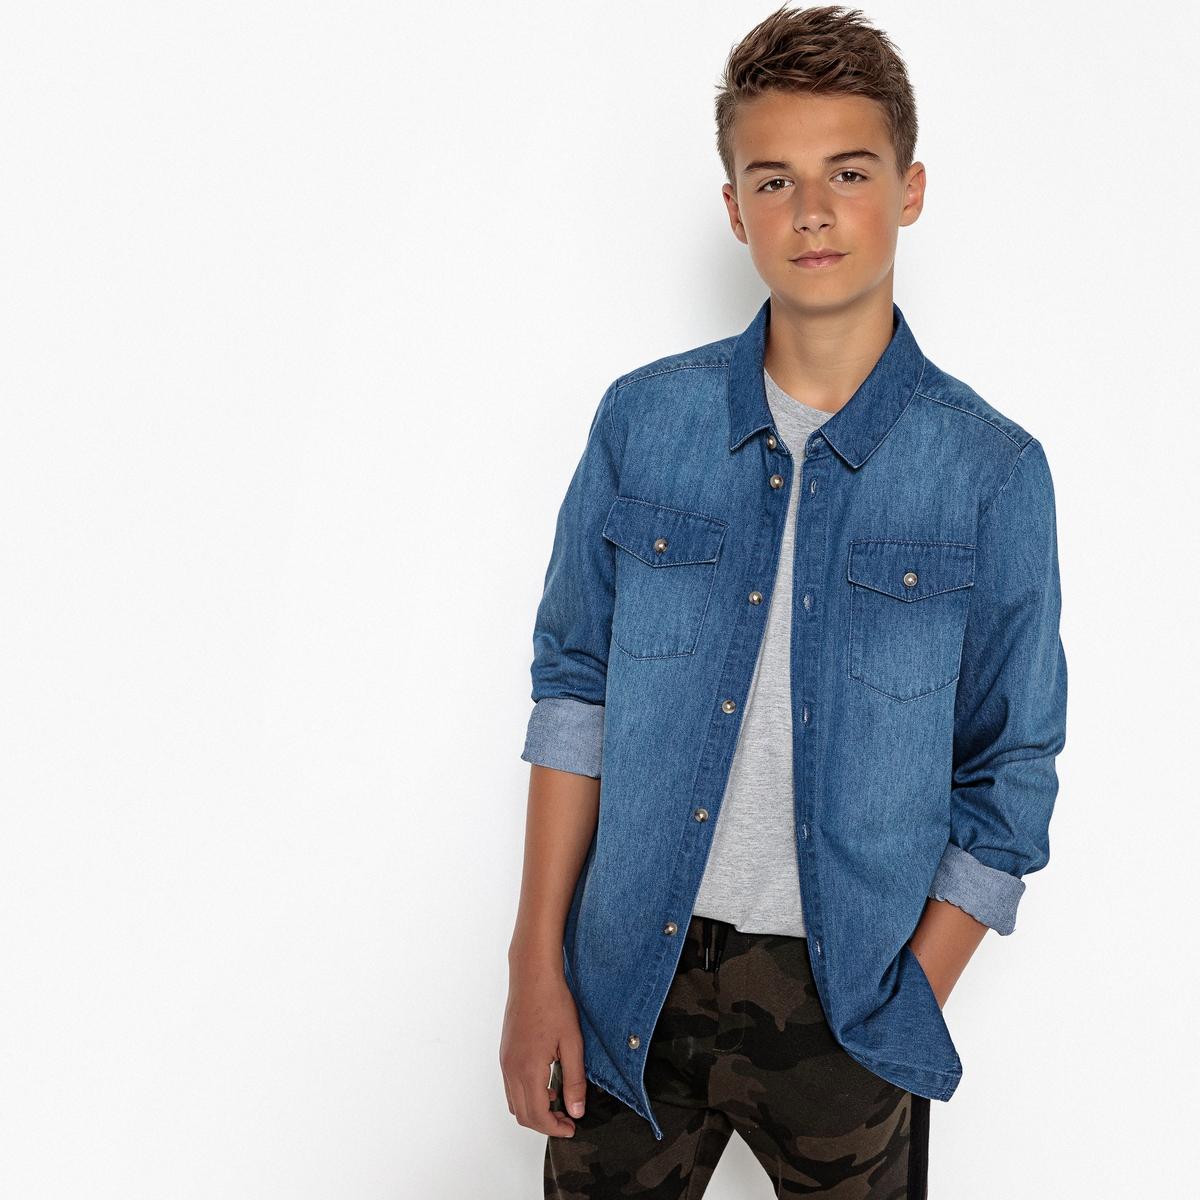 Рубашка La Redoute Джинсовая 16 лет - 174 см синий рубашка la redoute джинсовая узкая jjesheridan s синий